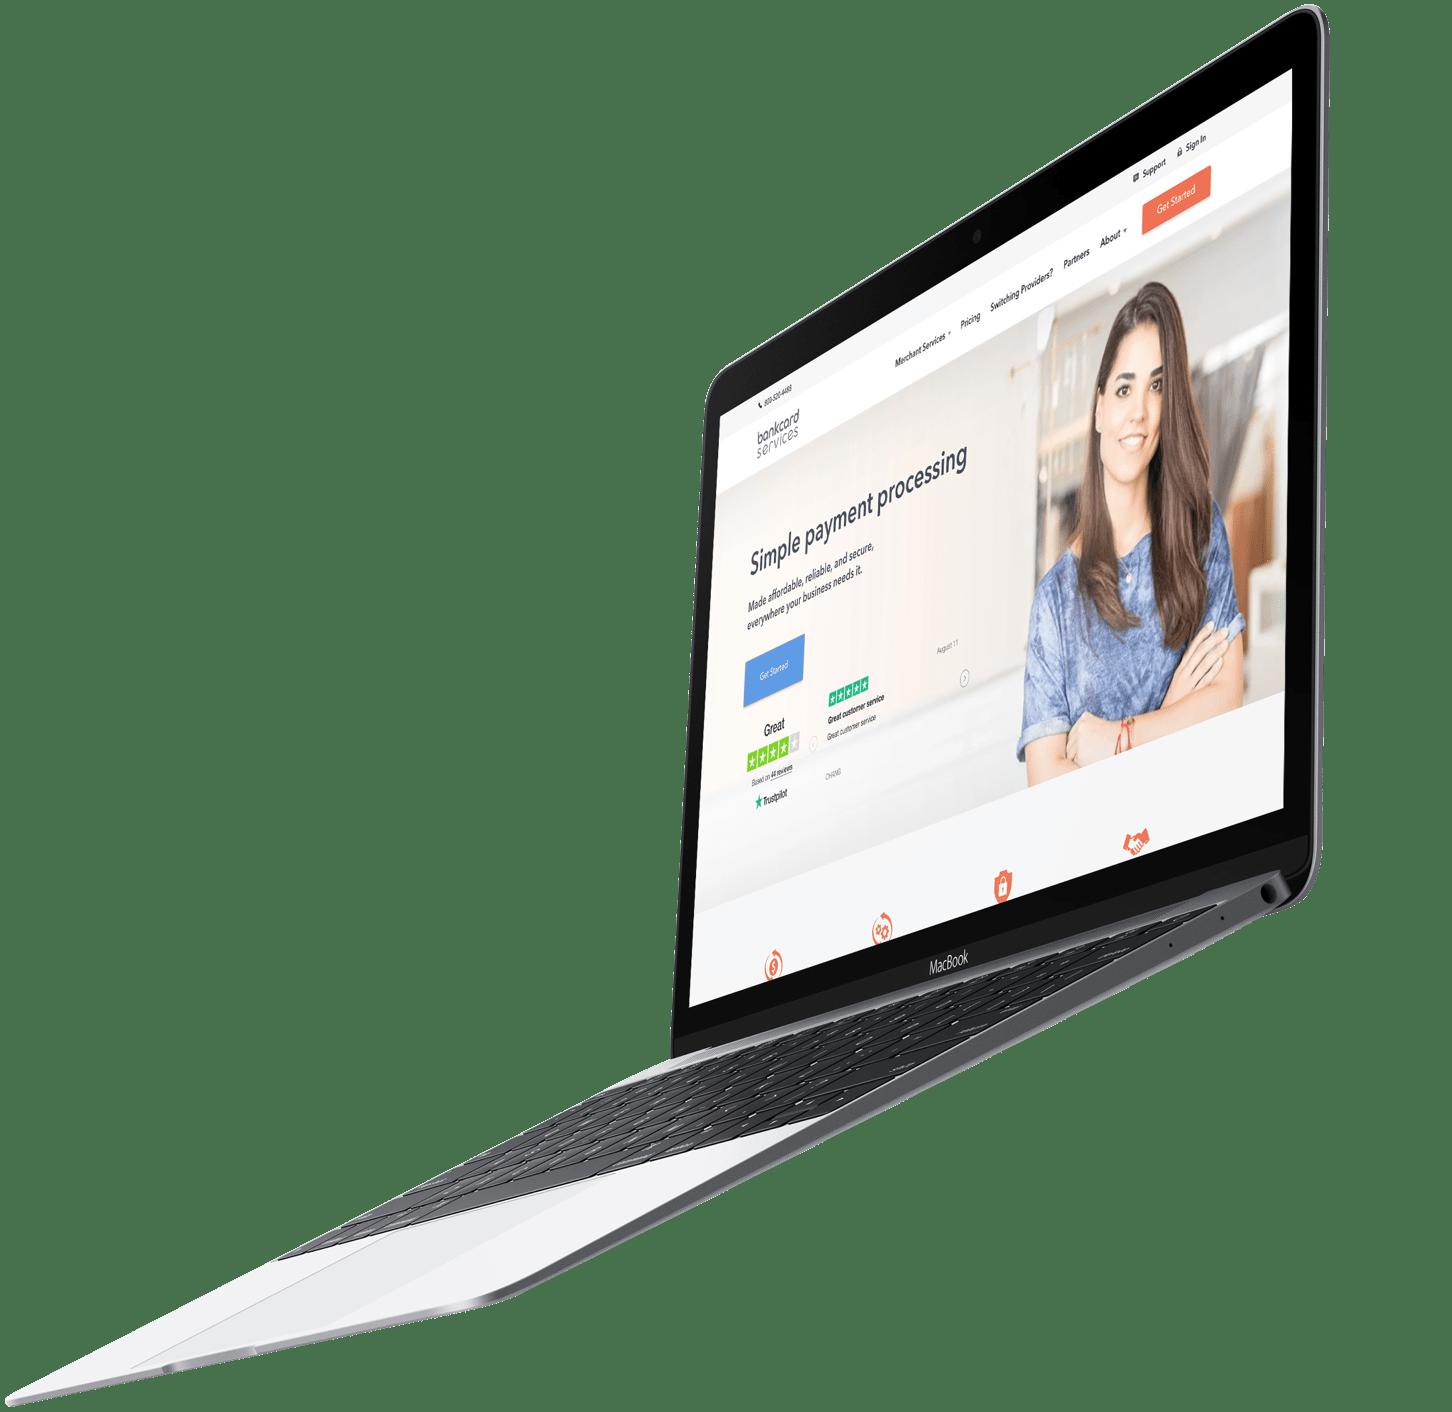 Screenshot of Bank Card Services website on a laptop